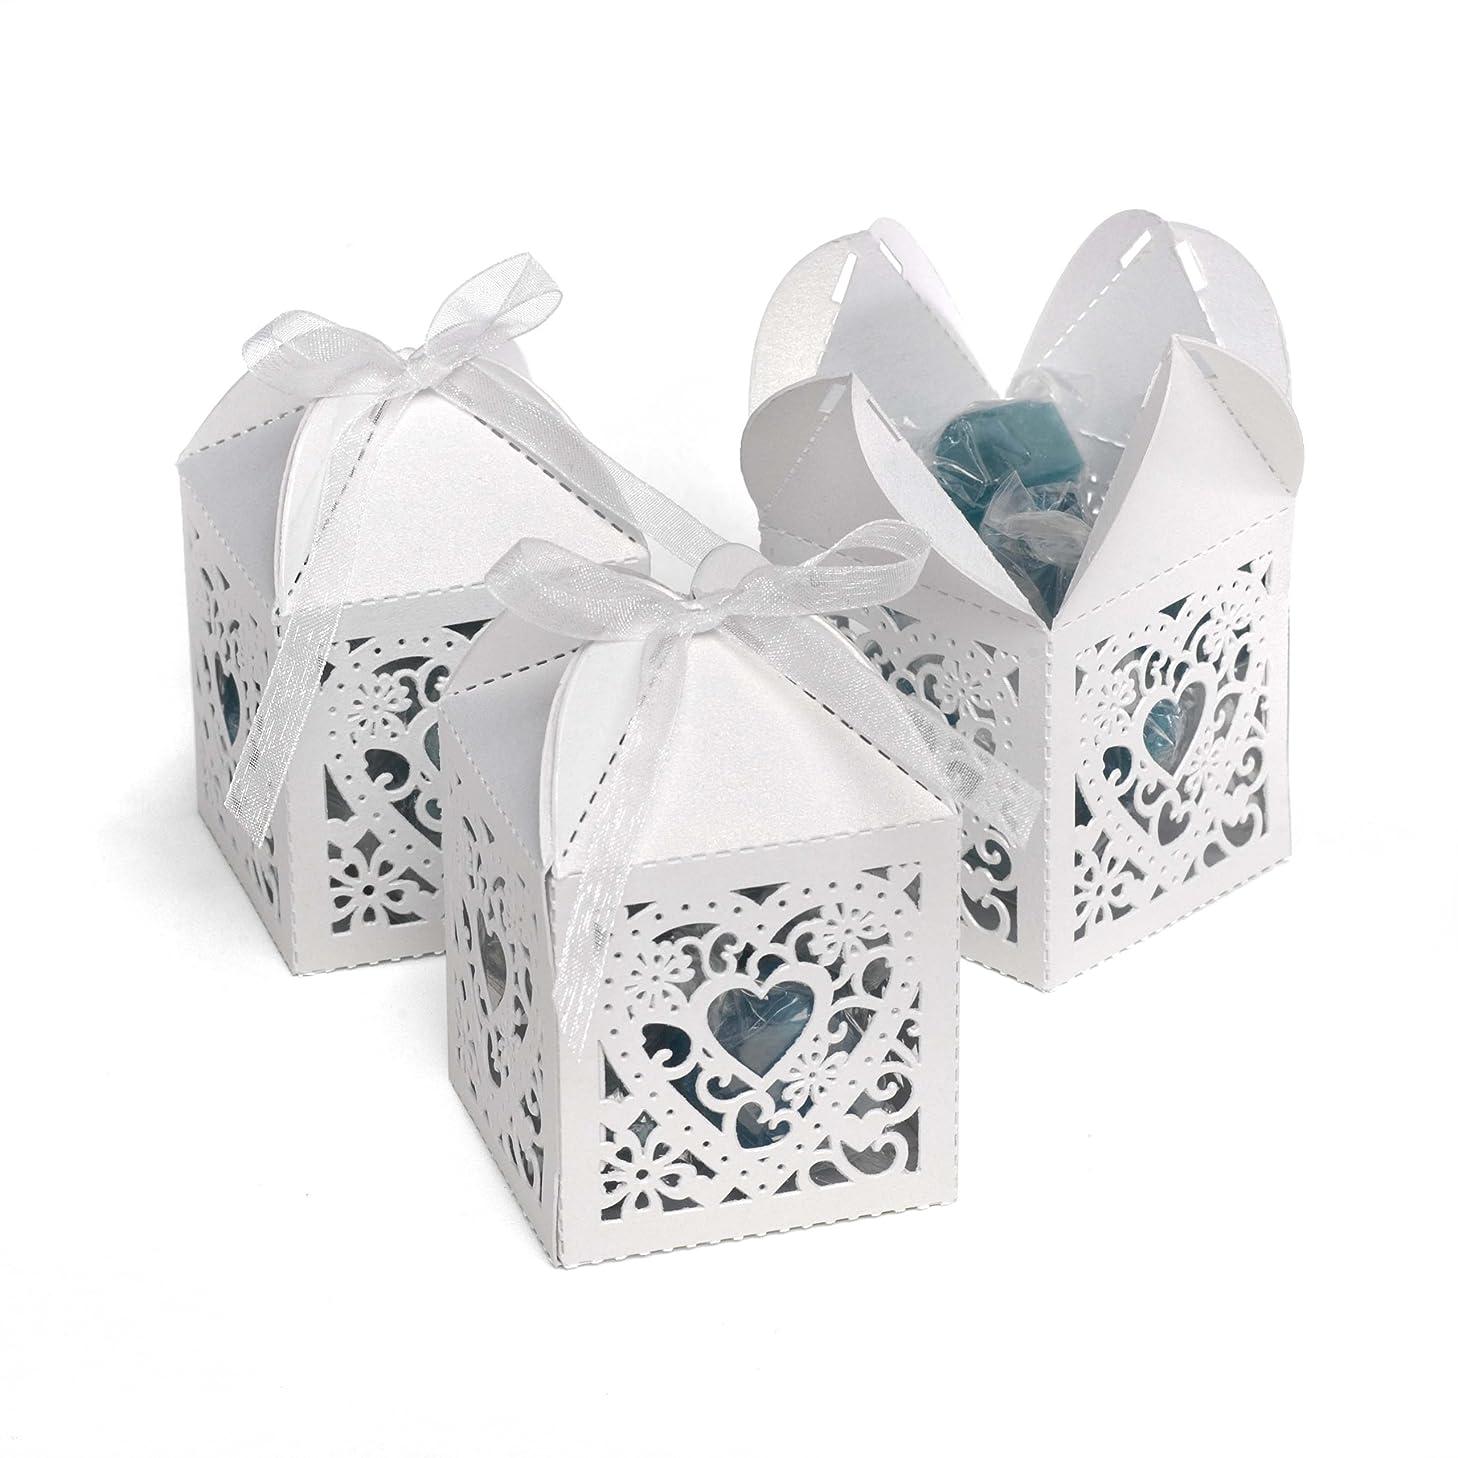 Hortense B. Hewitt Wedding Accessories 2-Inch Die Cut Decorative Favor Boxes, 25 Count, White